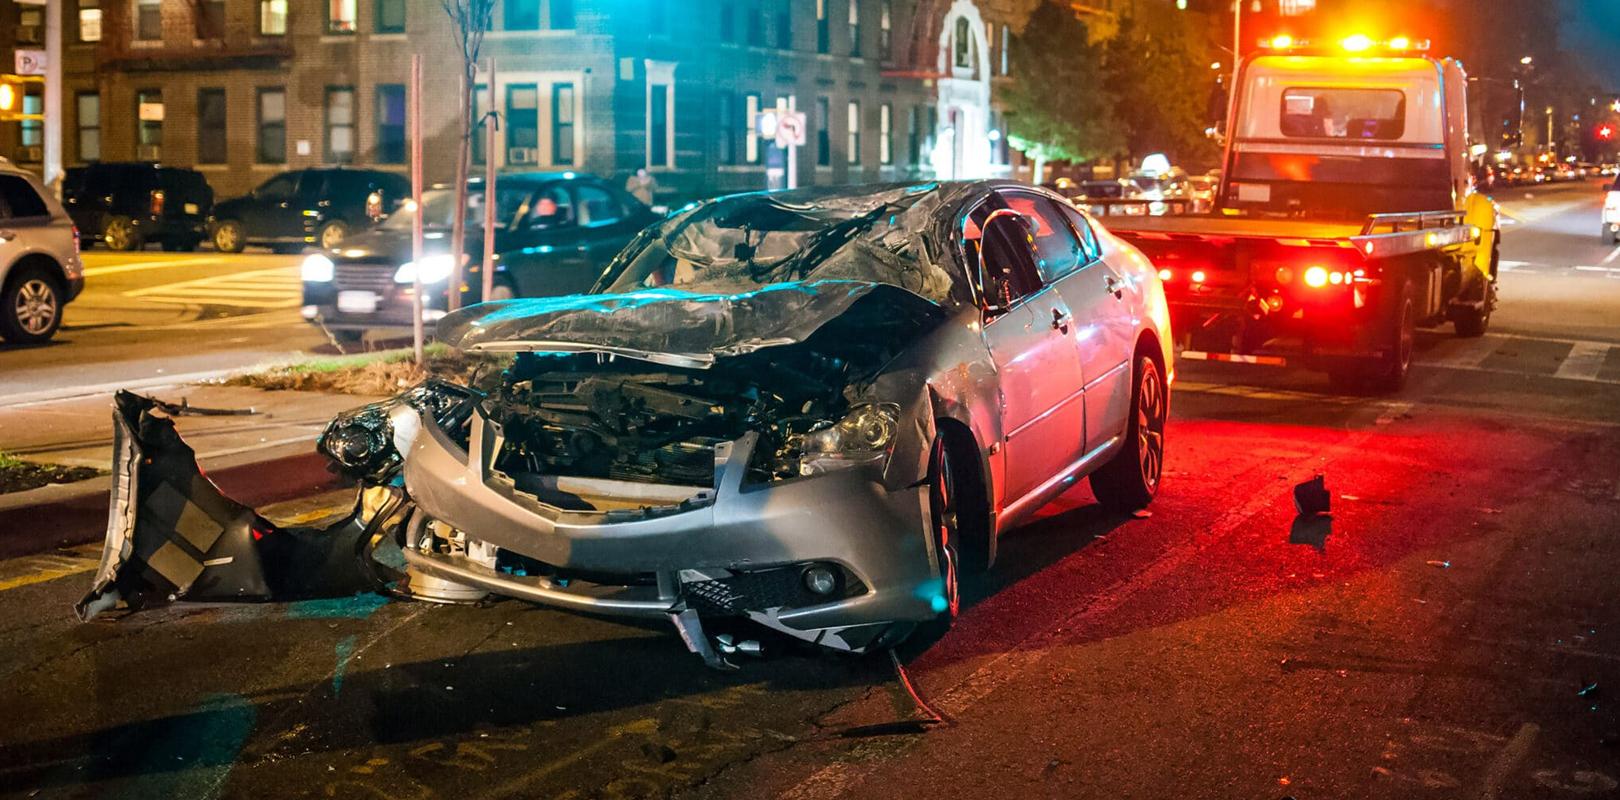 conduccion-imprudente-carreras-ilegales